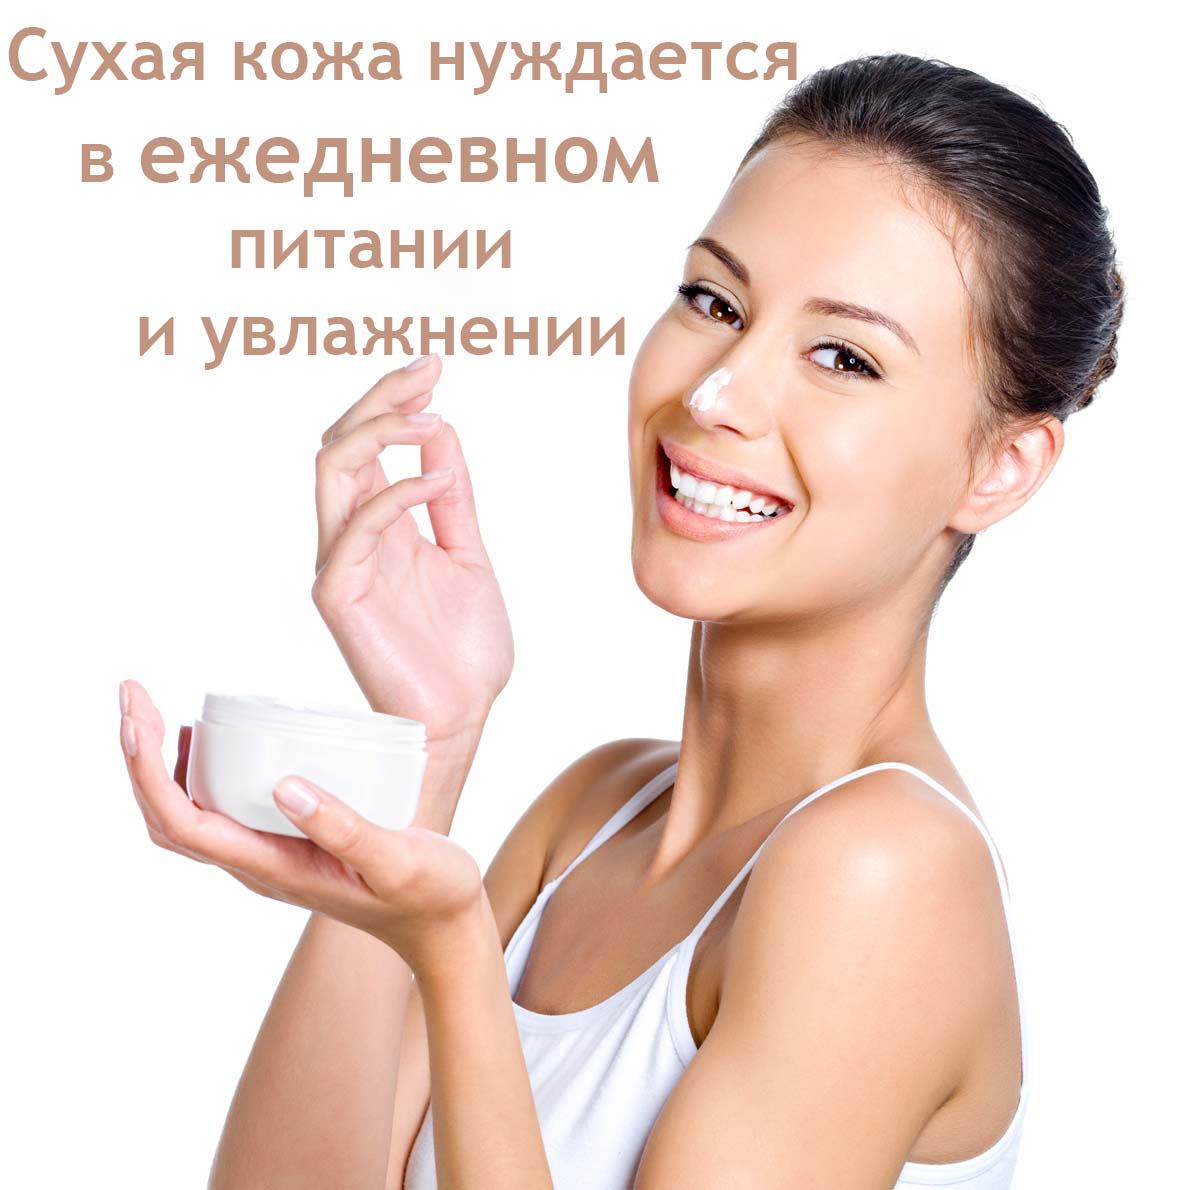 косметика для ухода за сухой кожей лица